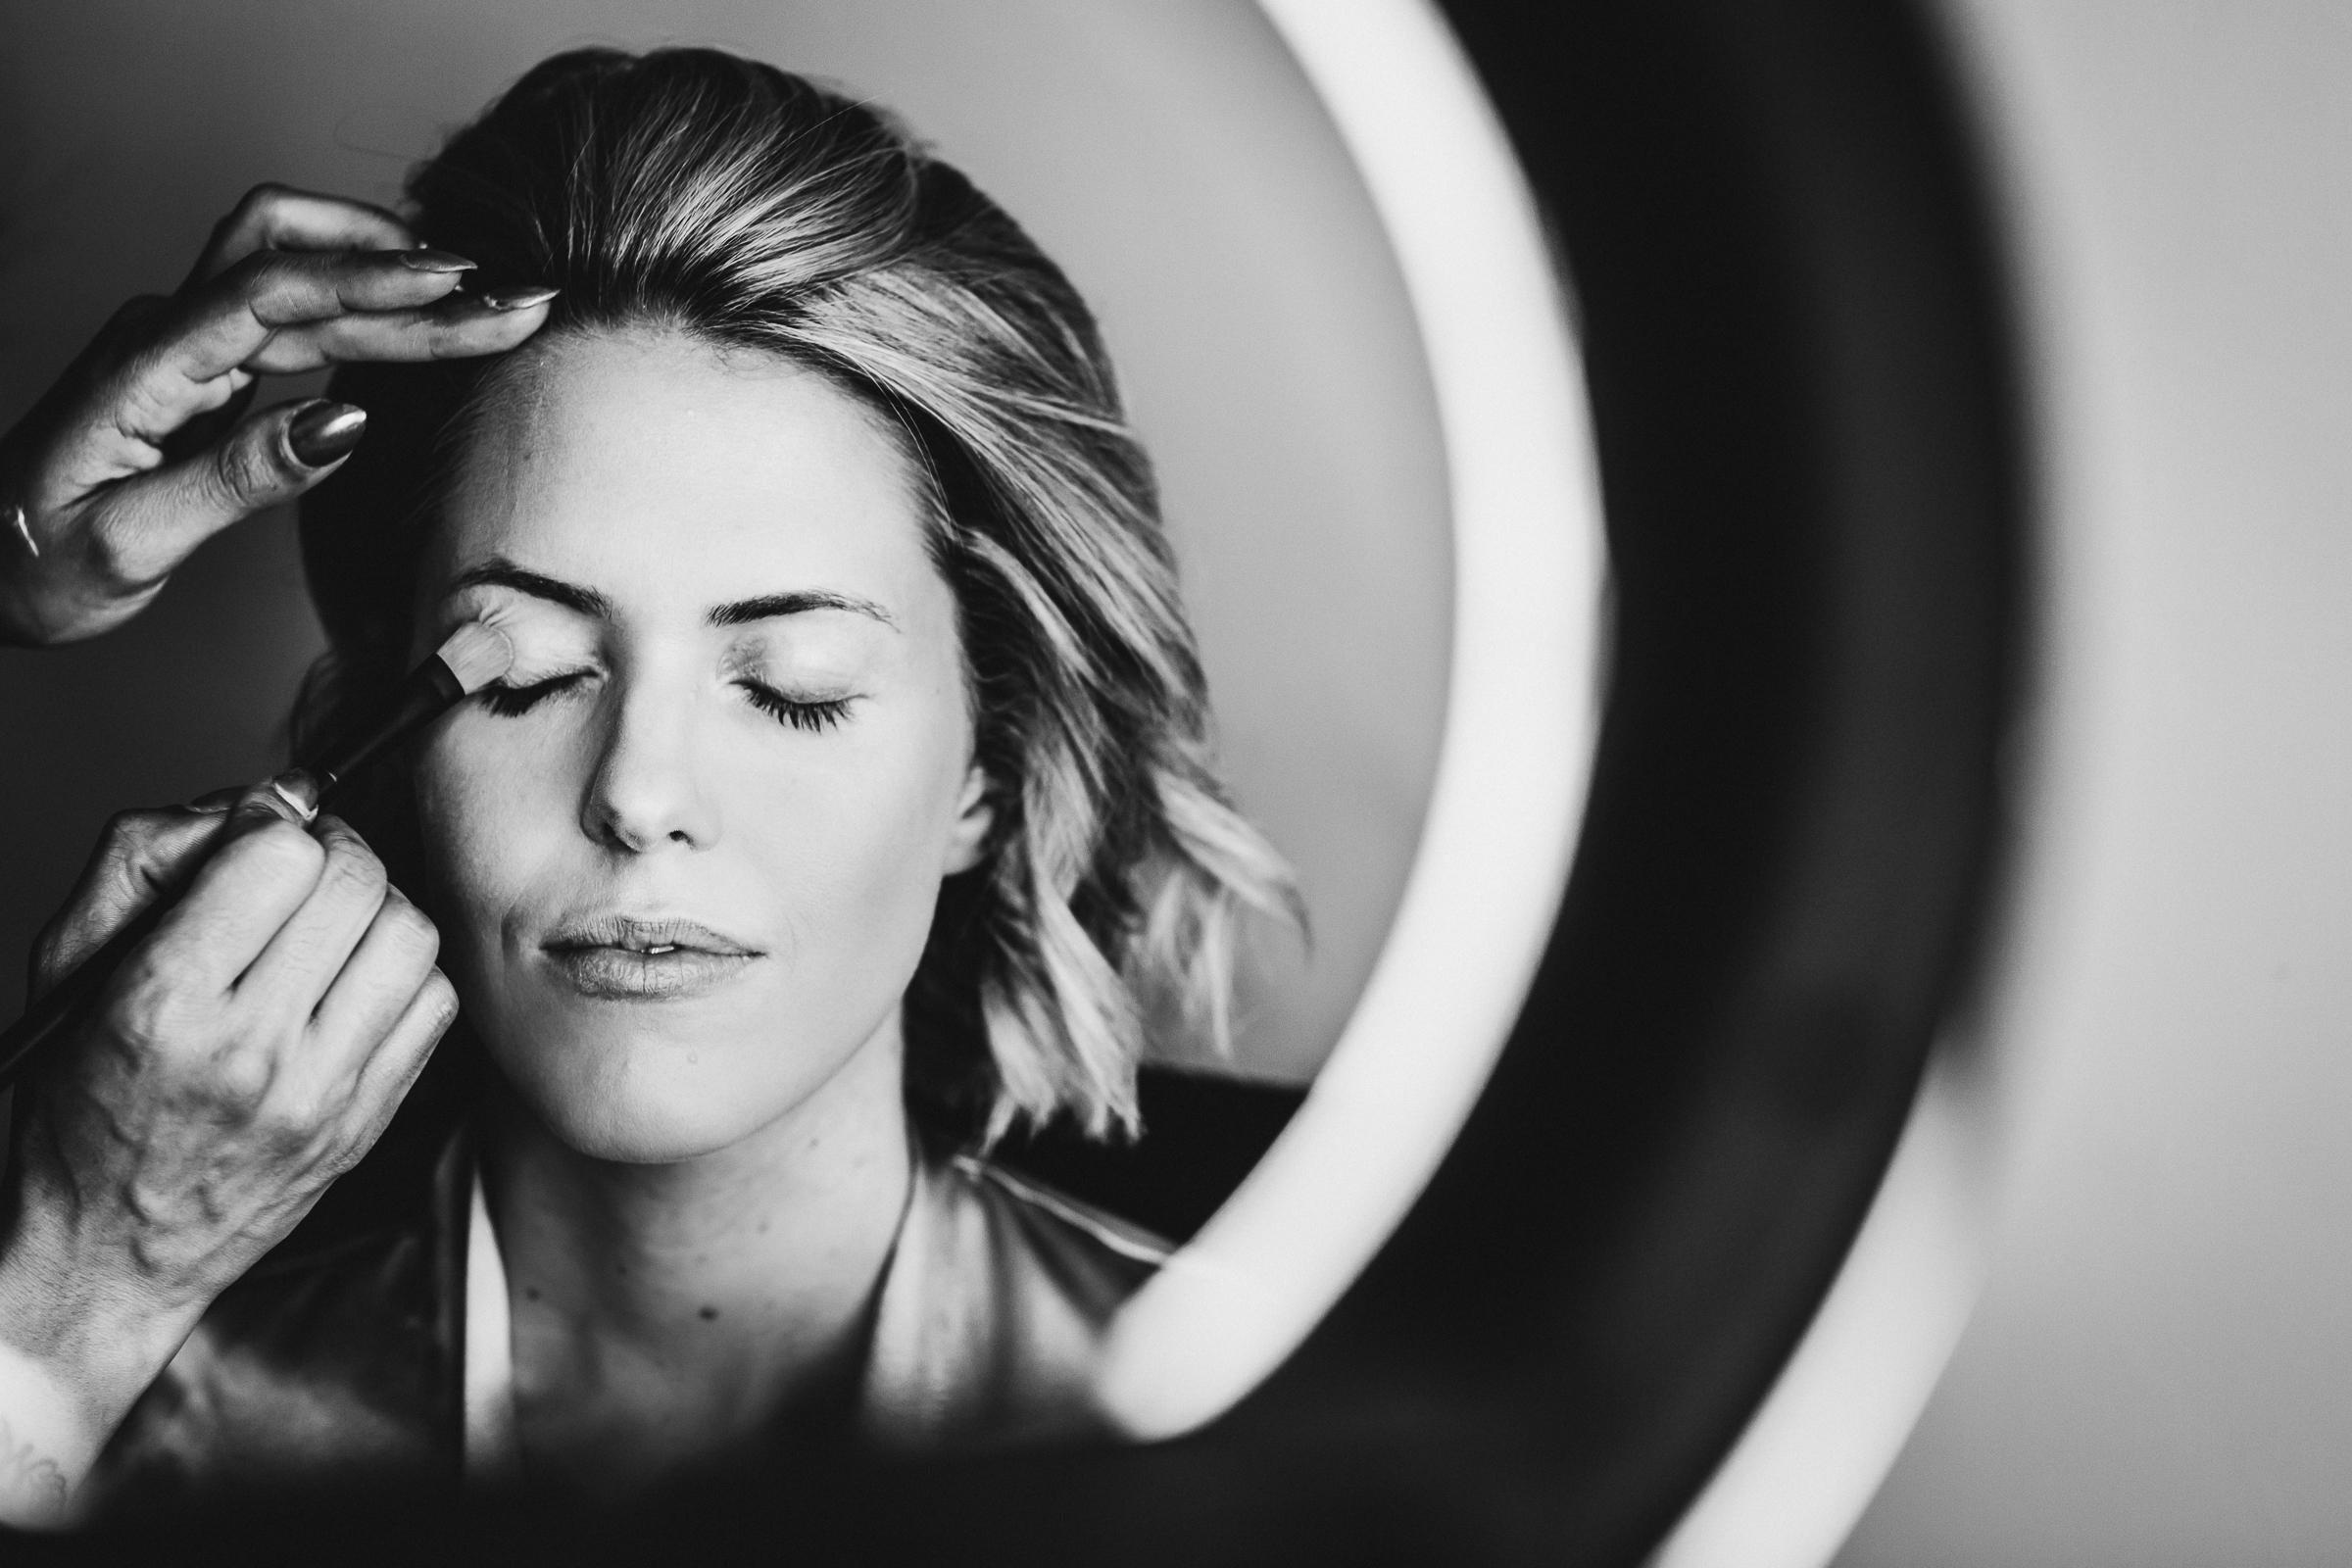 New-York-Documentary-Wedding-Photography-Best-Of-2017-by-Elvira-Kalviste-Photography-34.jpg